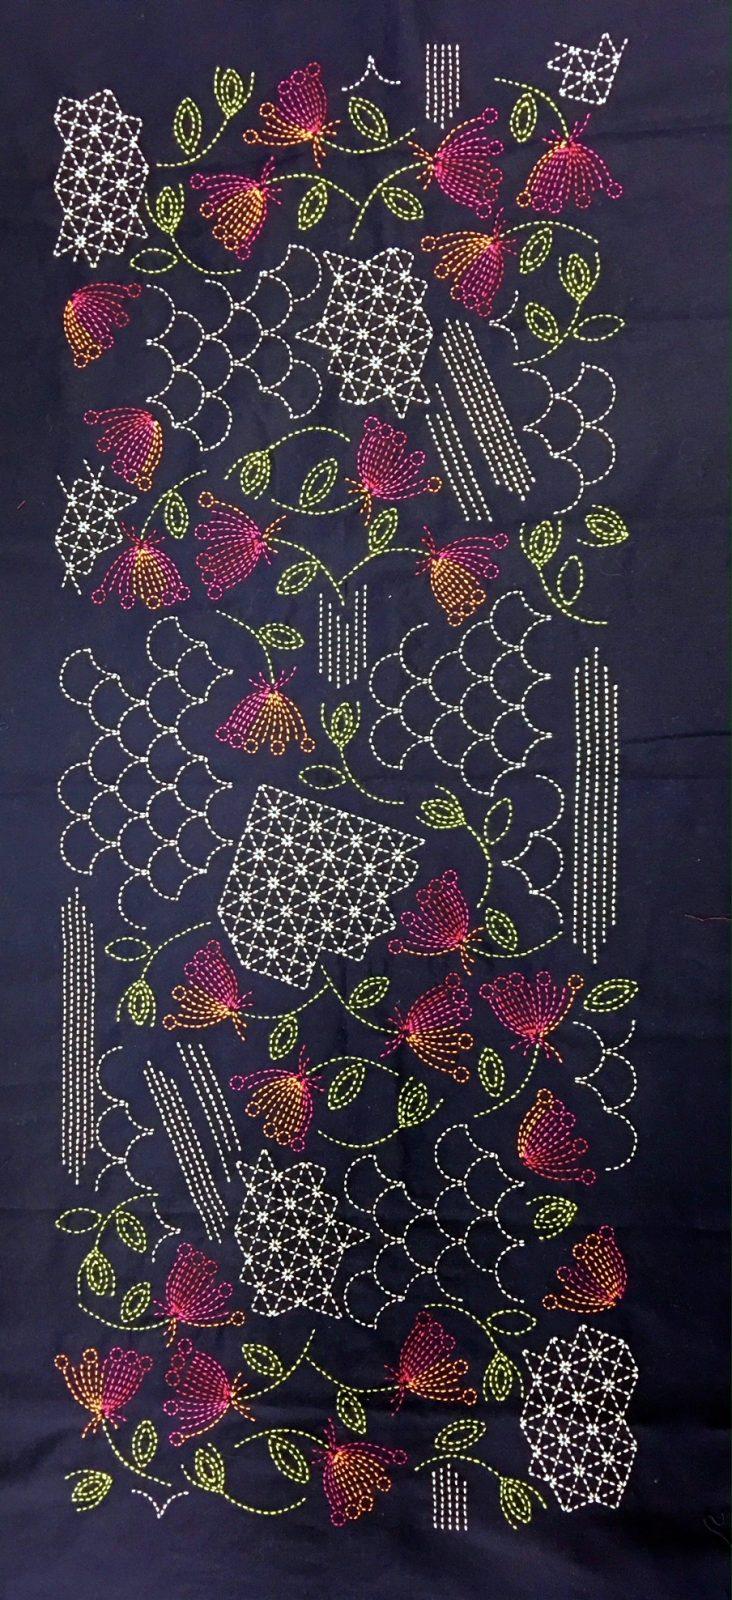 sashiko panel with shell pattern